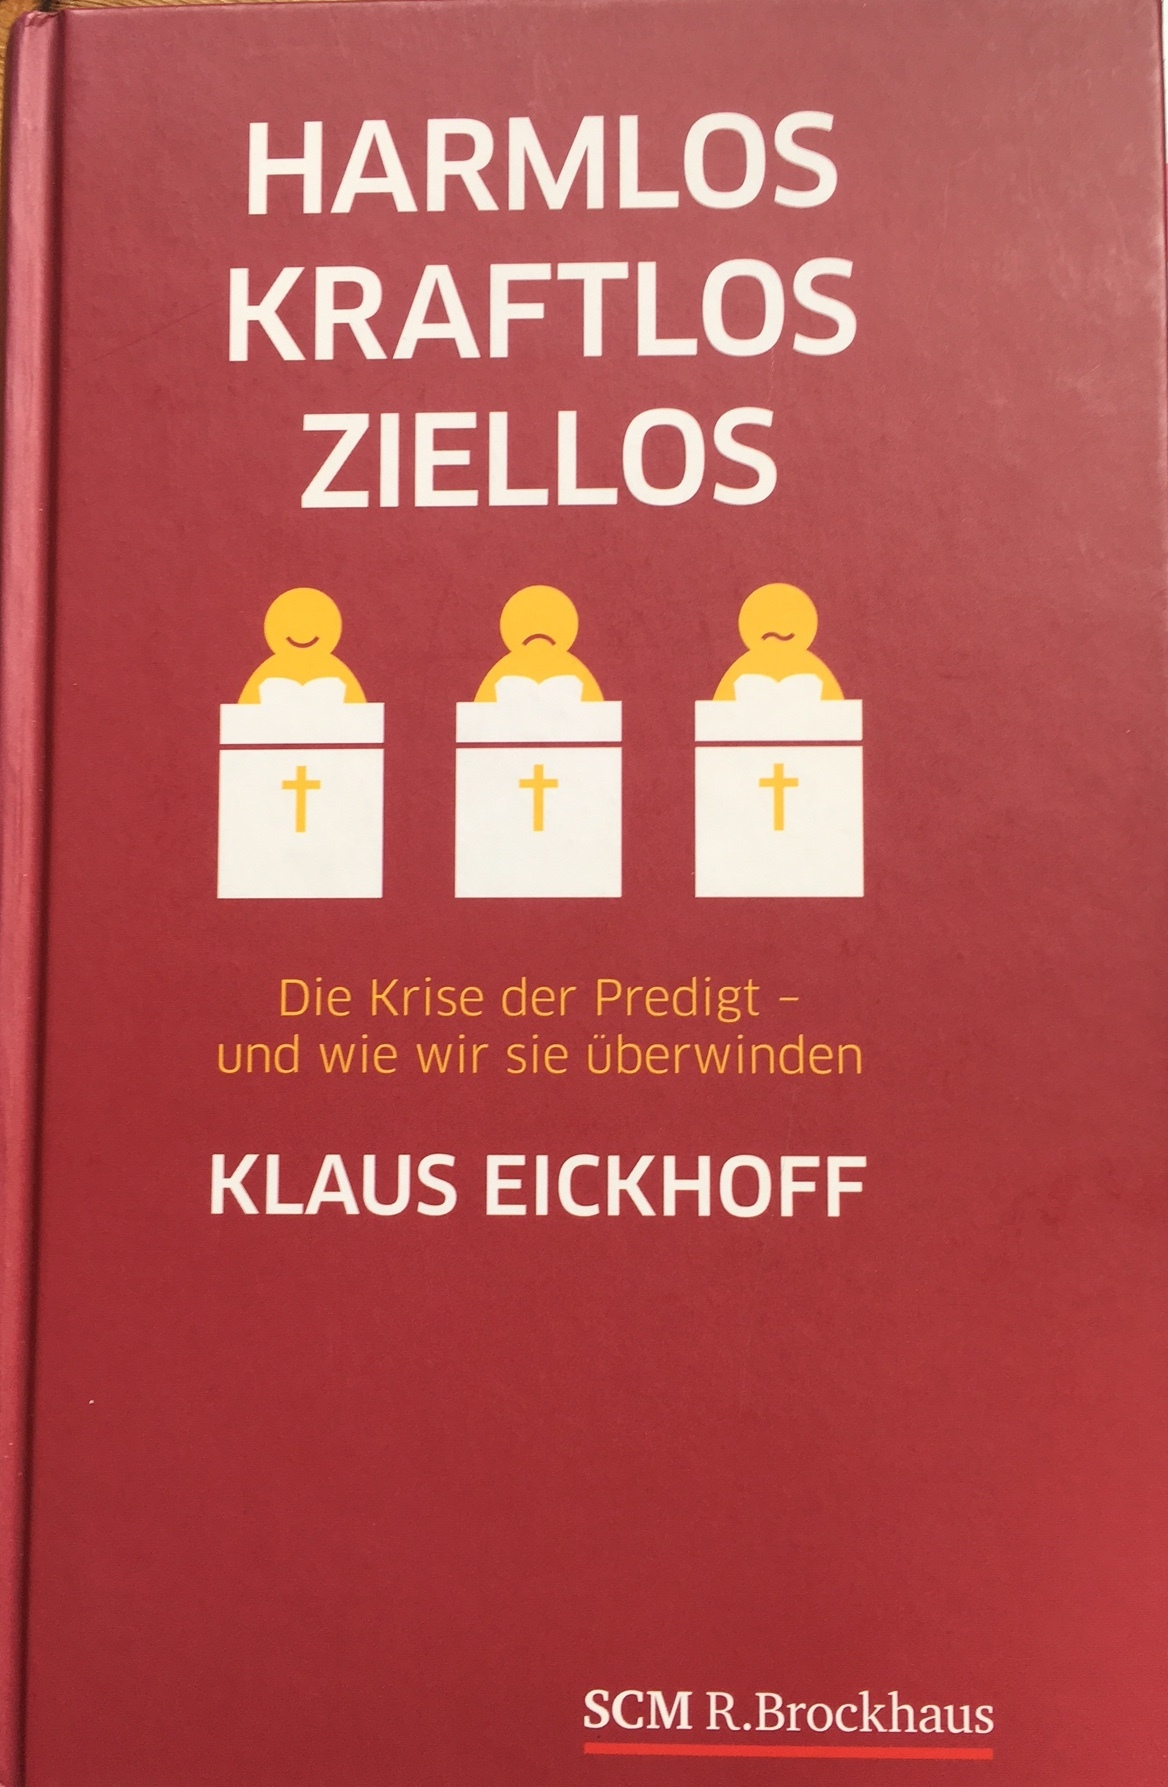 Eickhoff harmlos